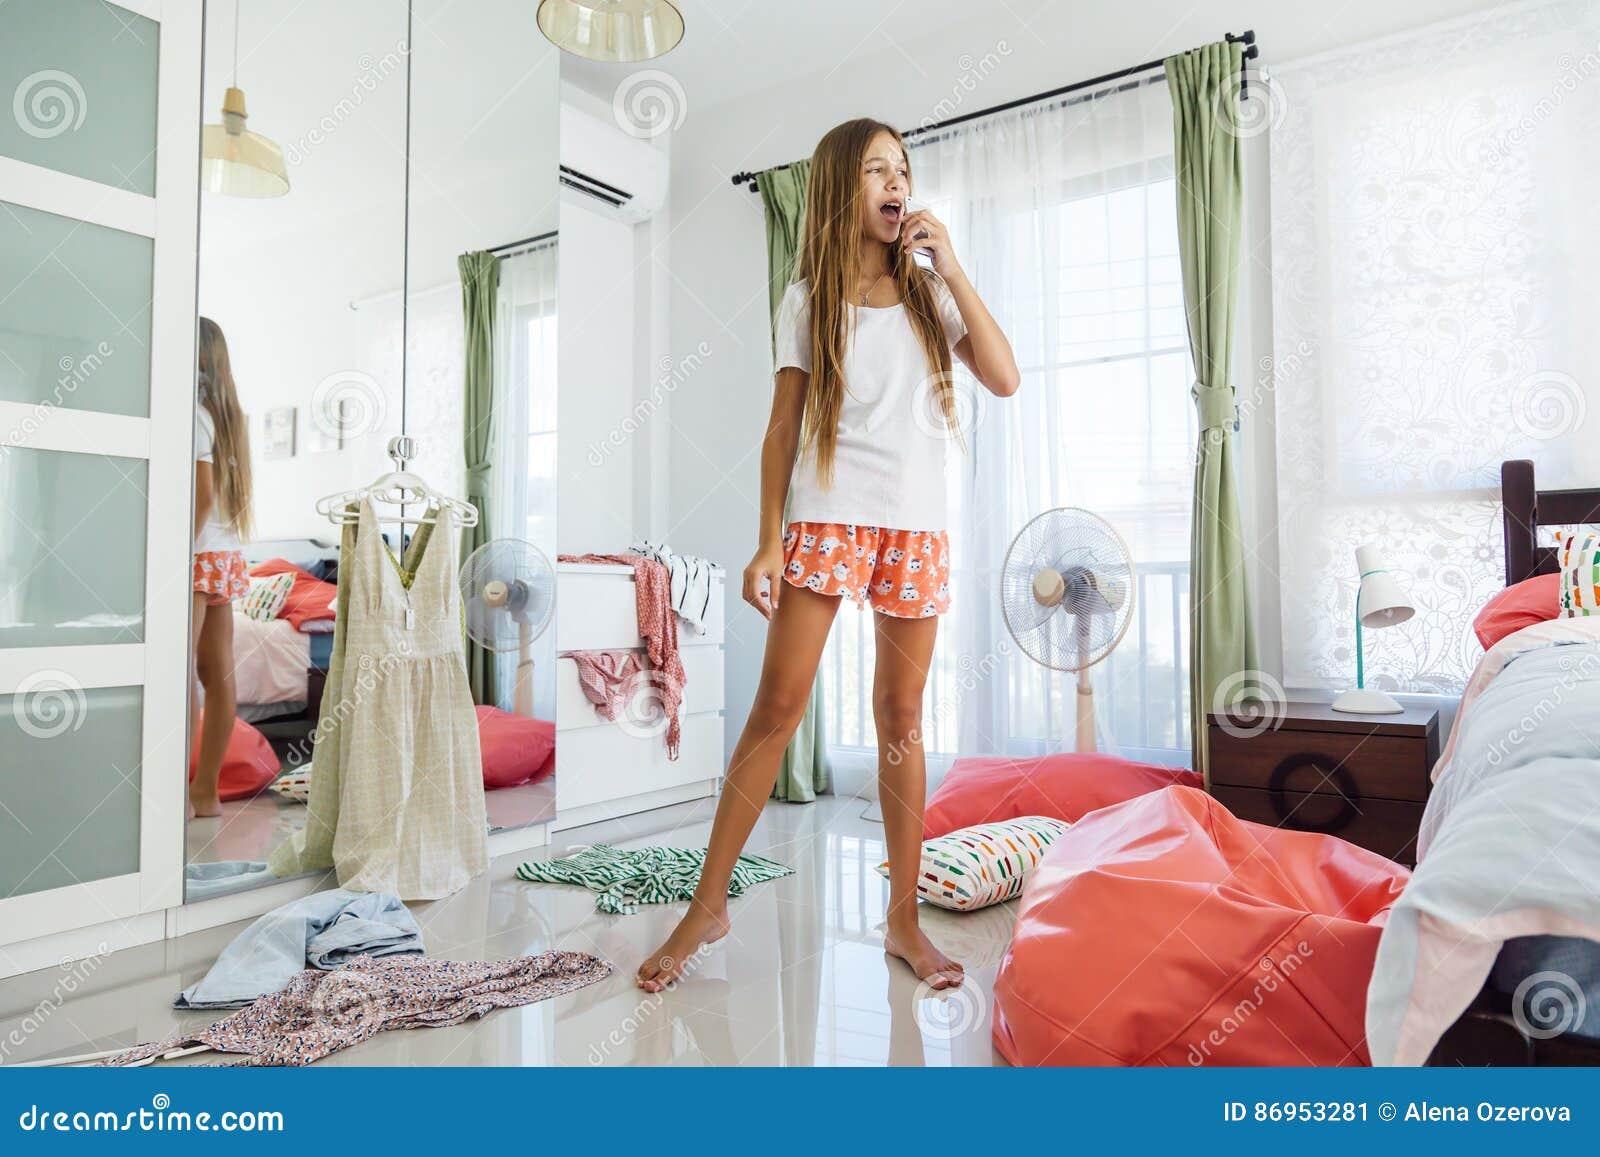 Bon Teenage Girl Choosing Clothing In Closet